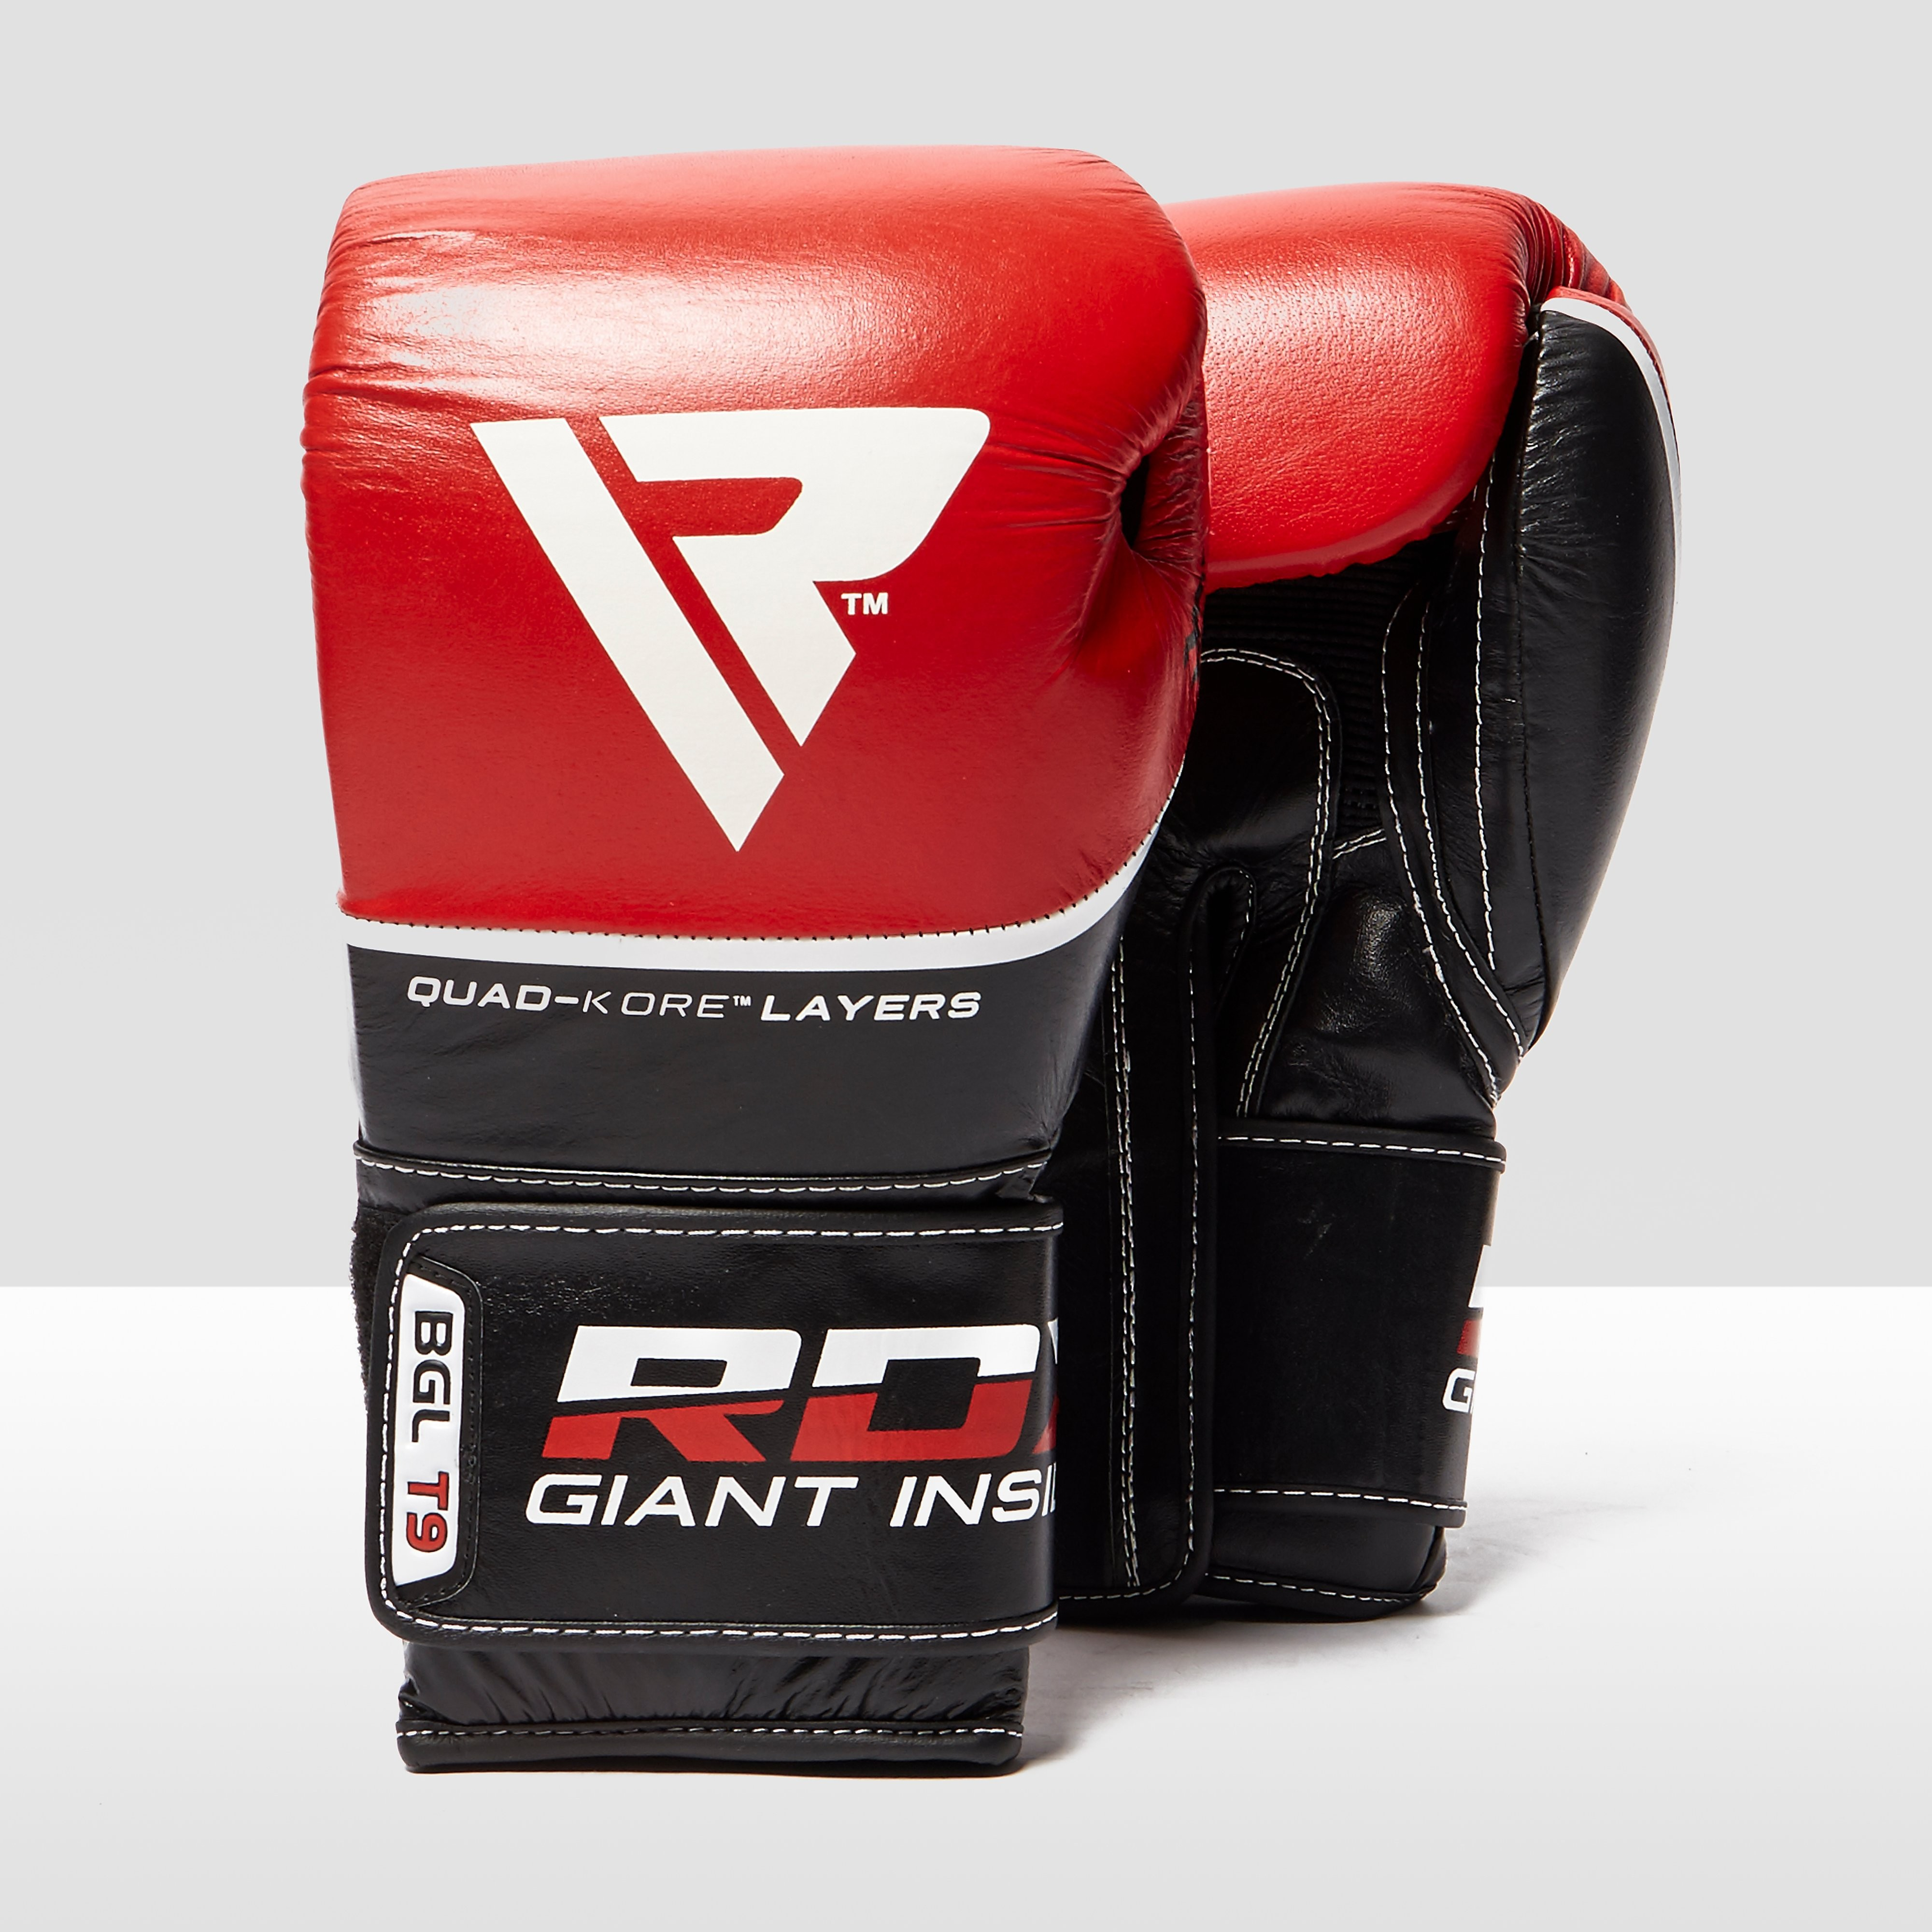 RDX INC Quad-Kore Leather Training Gloves